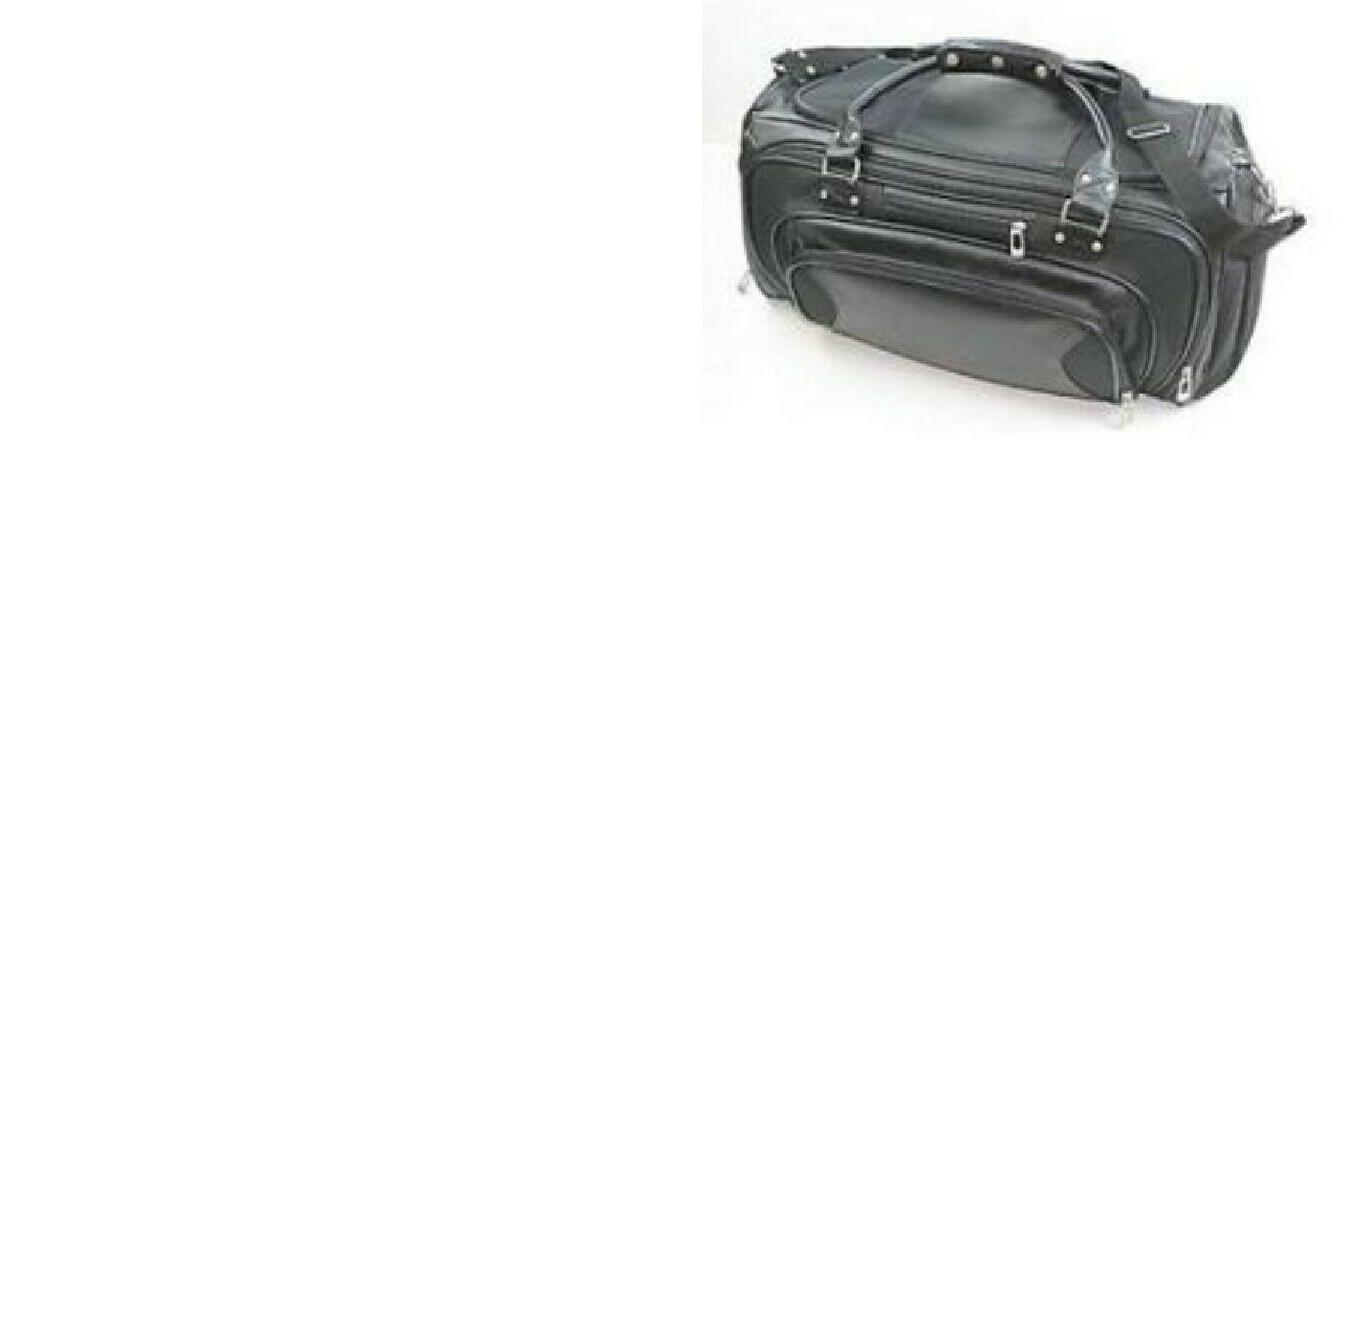 new new rare duffle bag tg0019 retail